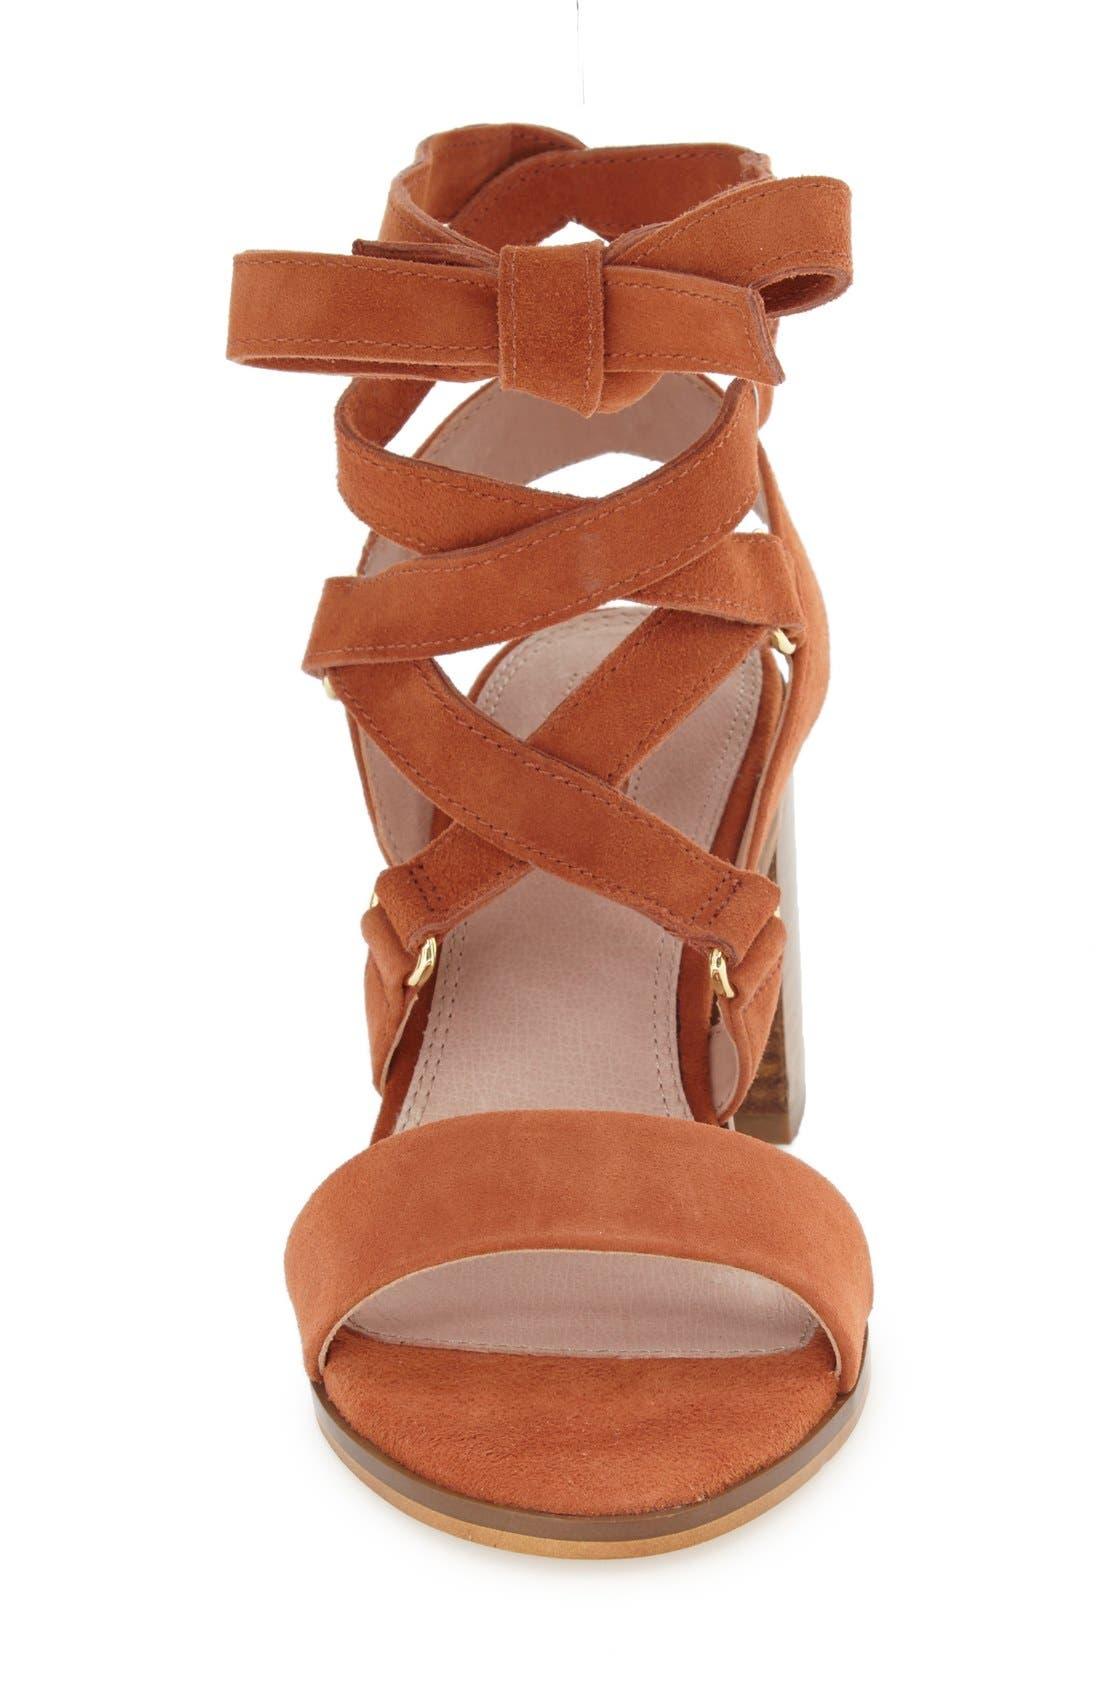 'Nadra' Lace-Up Sandal,                             Alternate thumbnail 3, color,                             Orange Suede